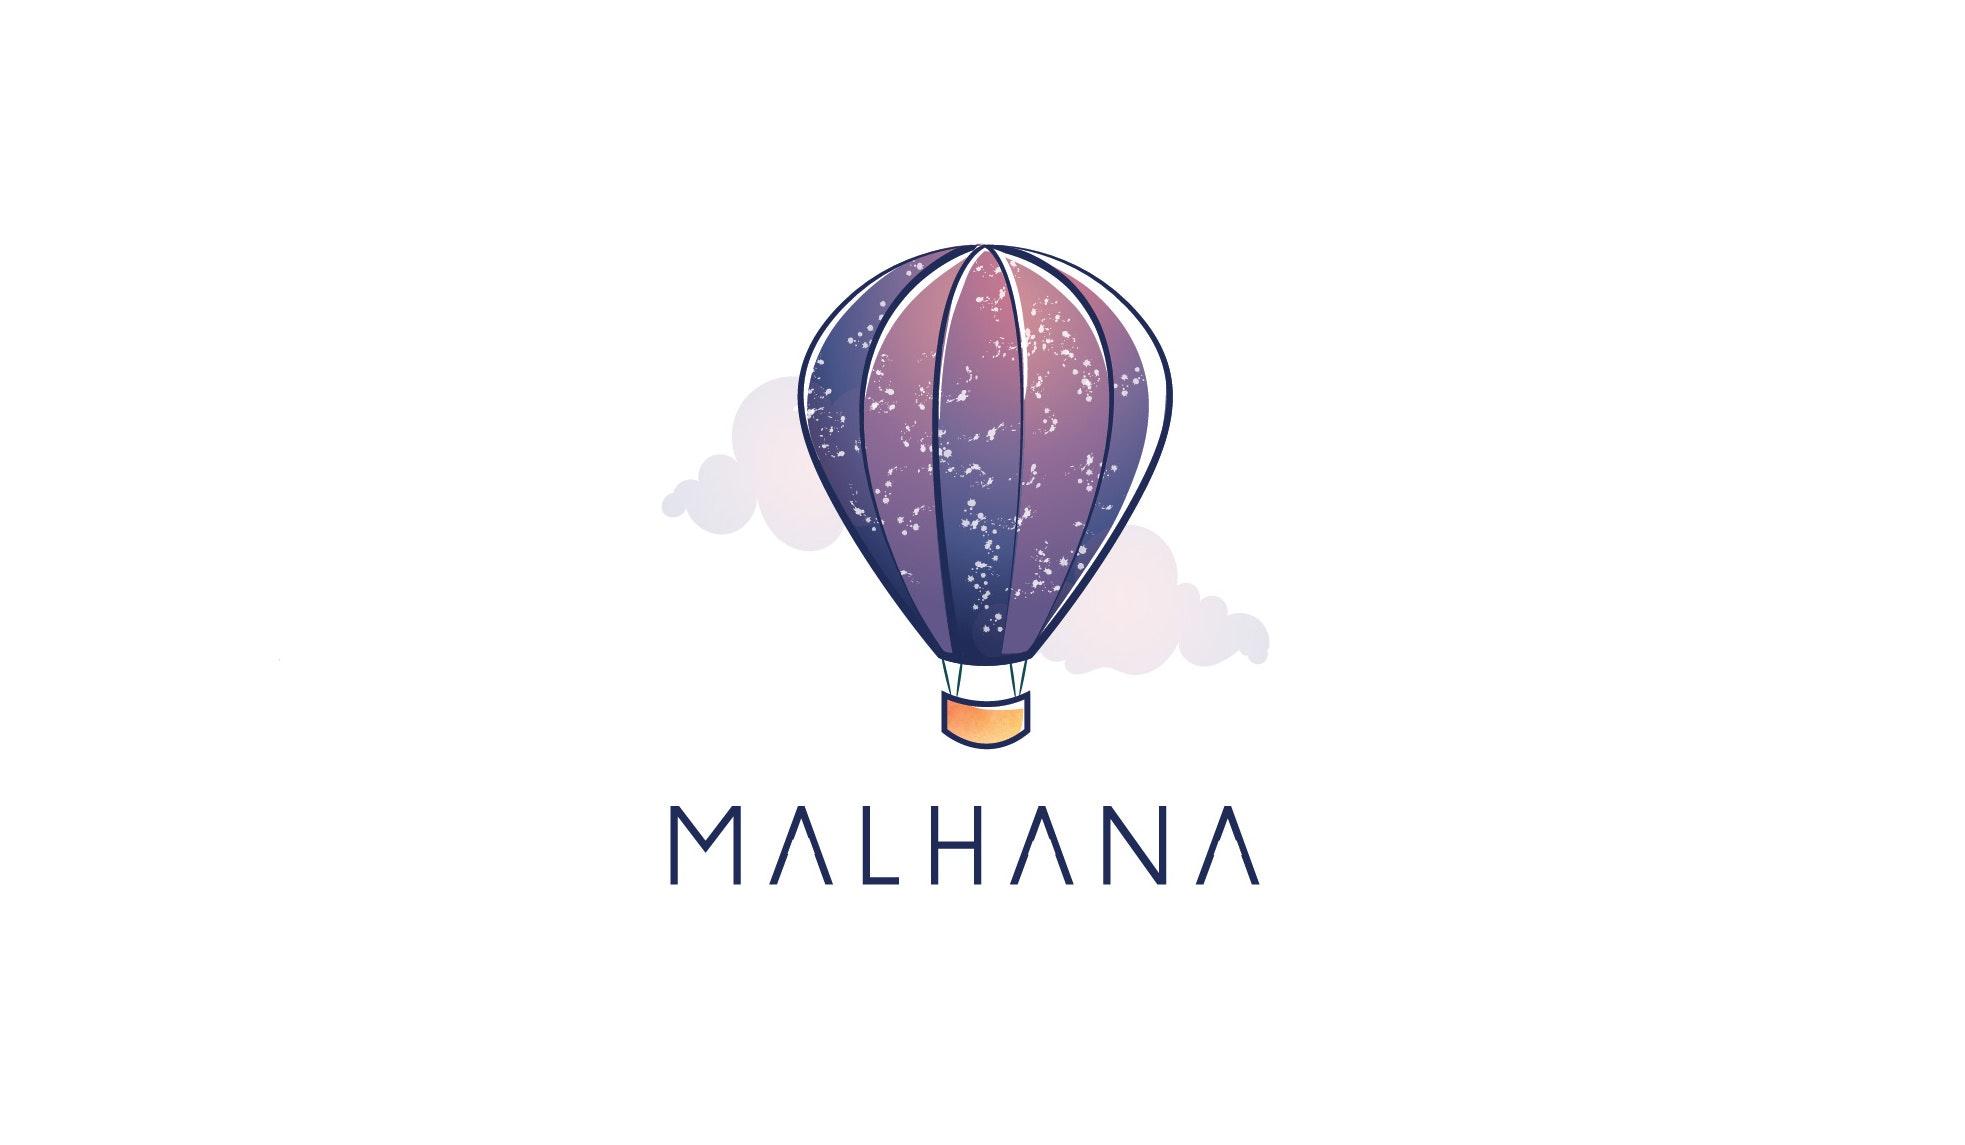 Malhana logo design